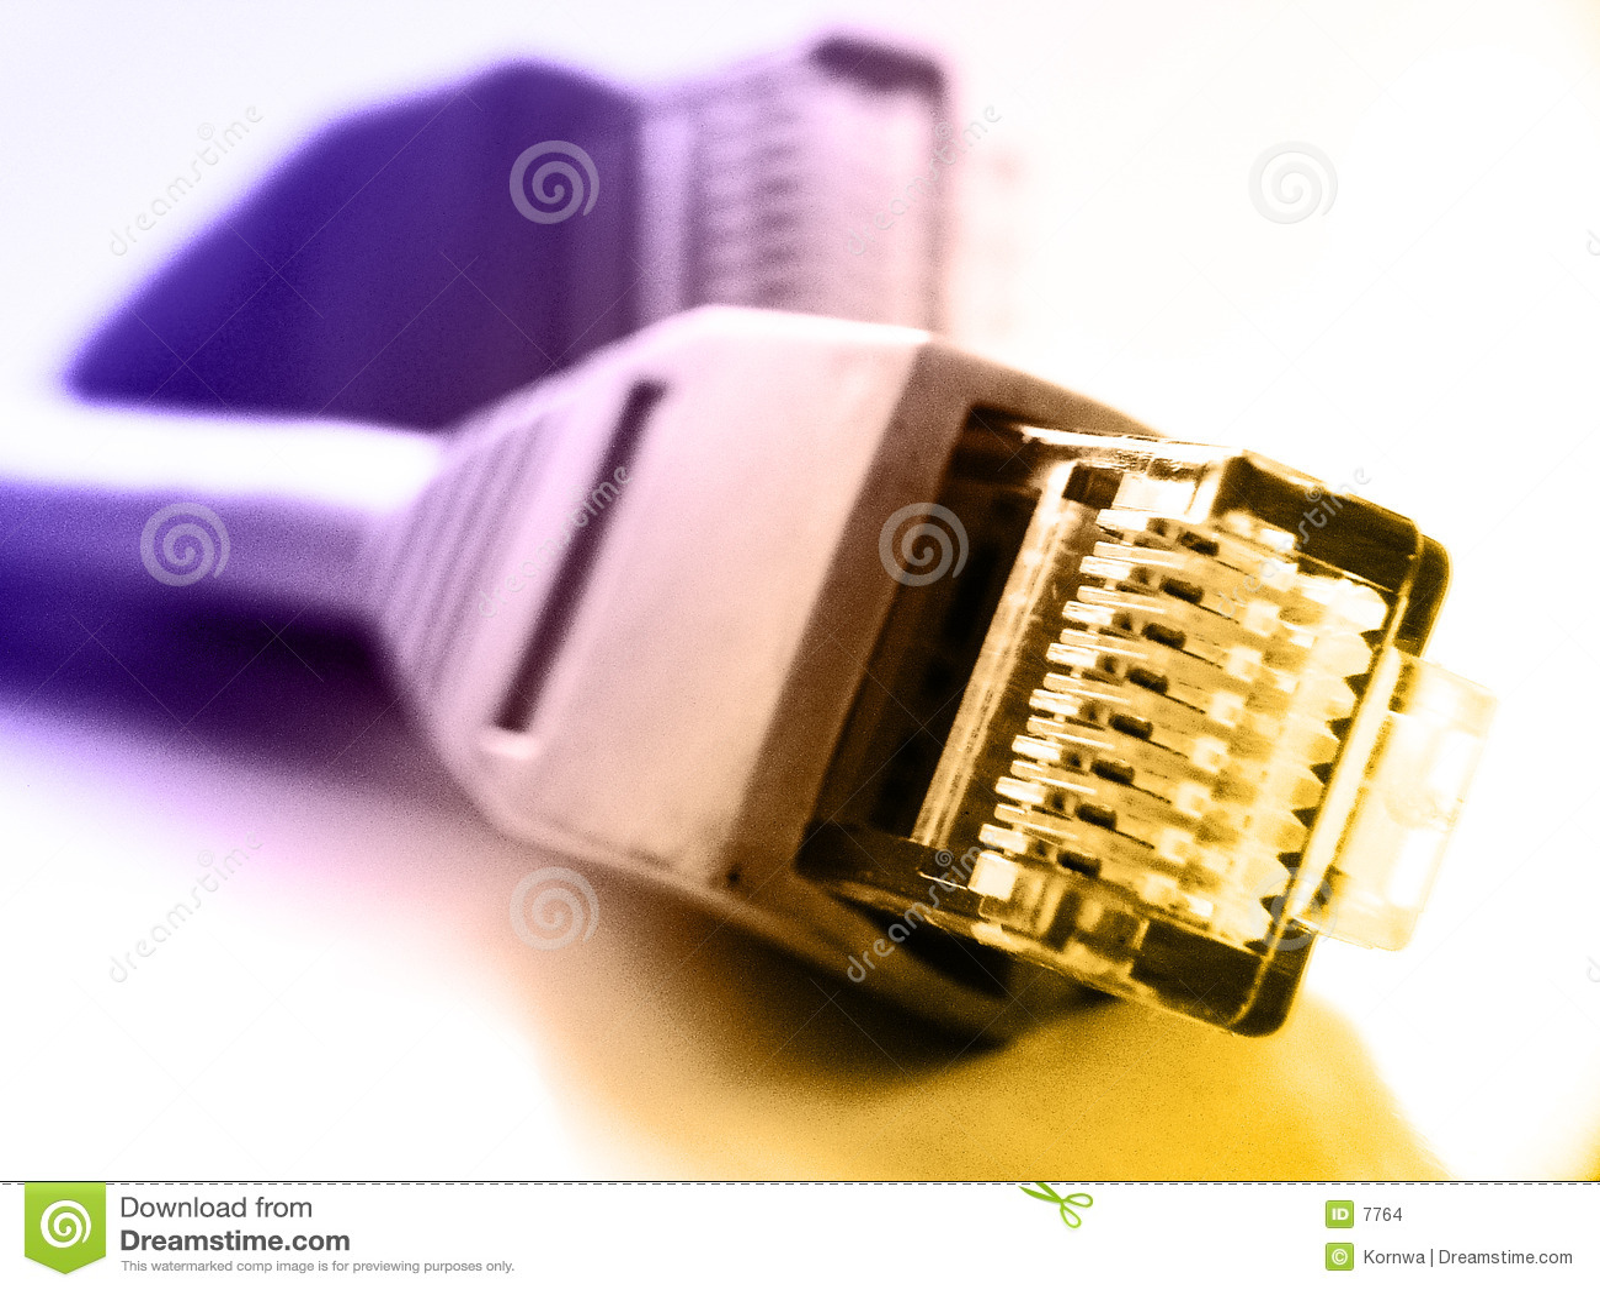 Network rj45 plugins